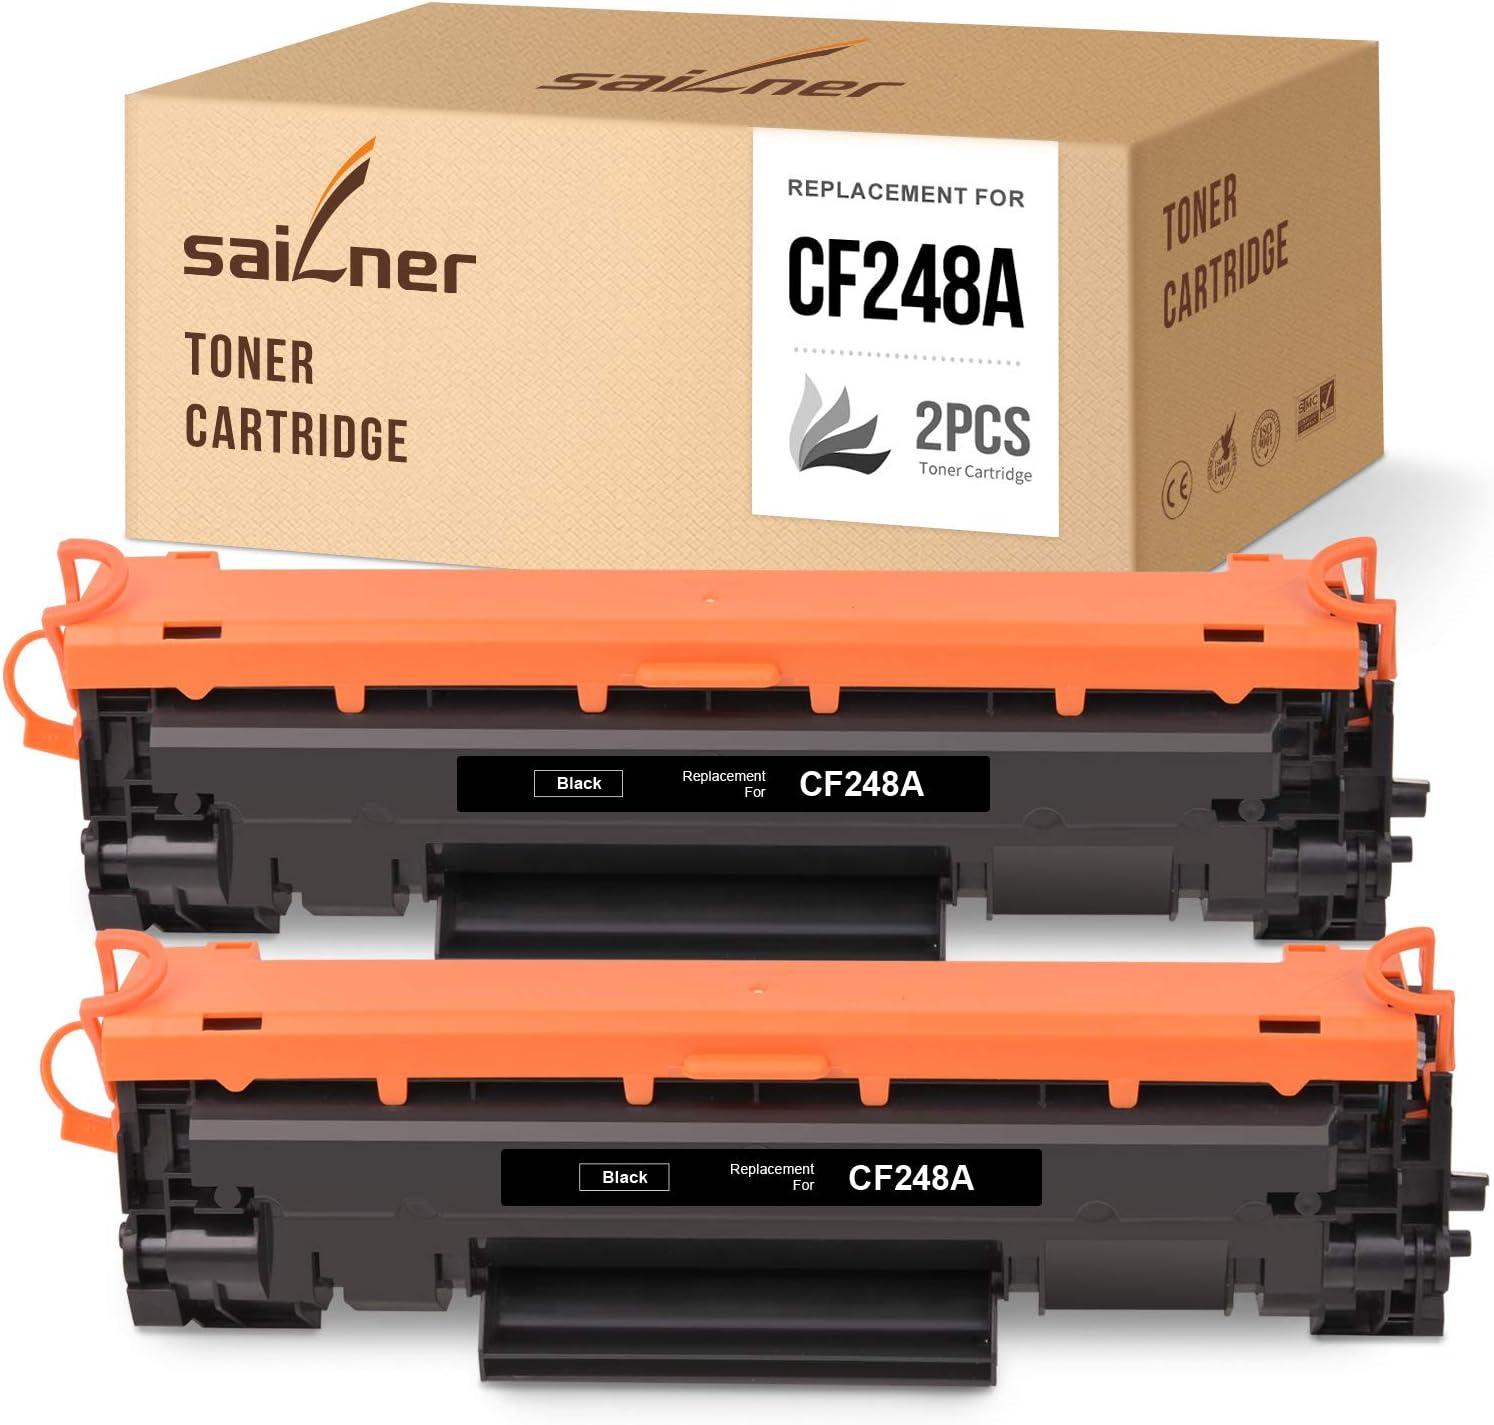 SAILNER Compatible Toner Cartridge Replacement for HP CF248A 48A use with Laserjet Pro M15w M15a M15 MFP M29w M29a M29 M28 M28w M28a (Black, 2 Pack)